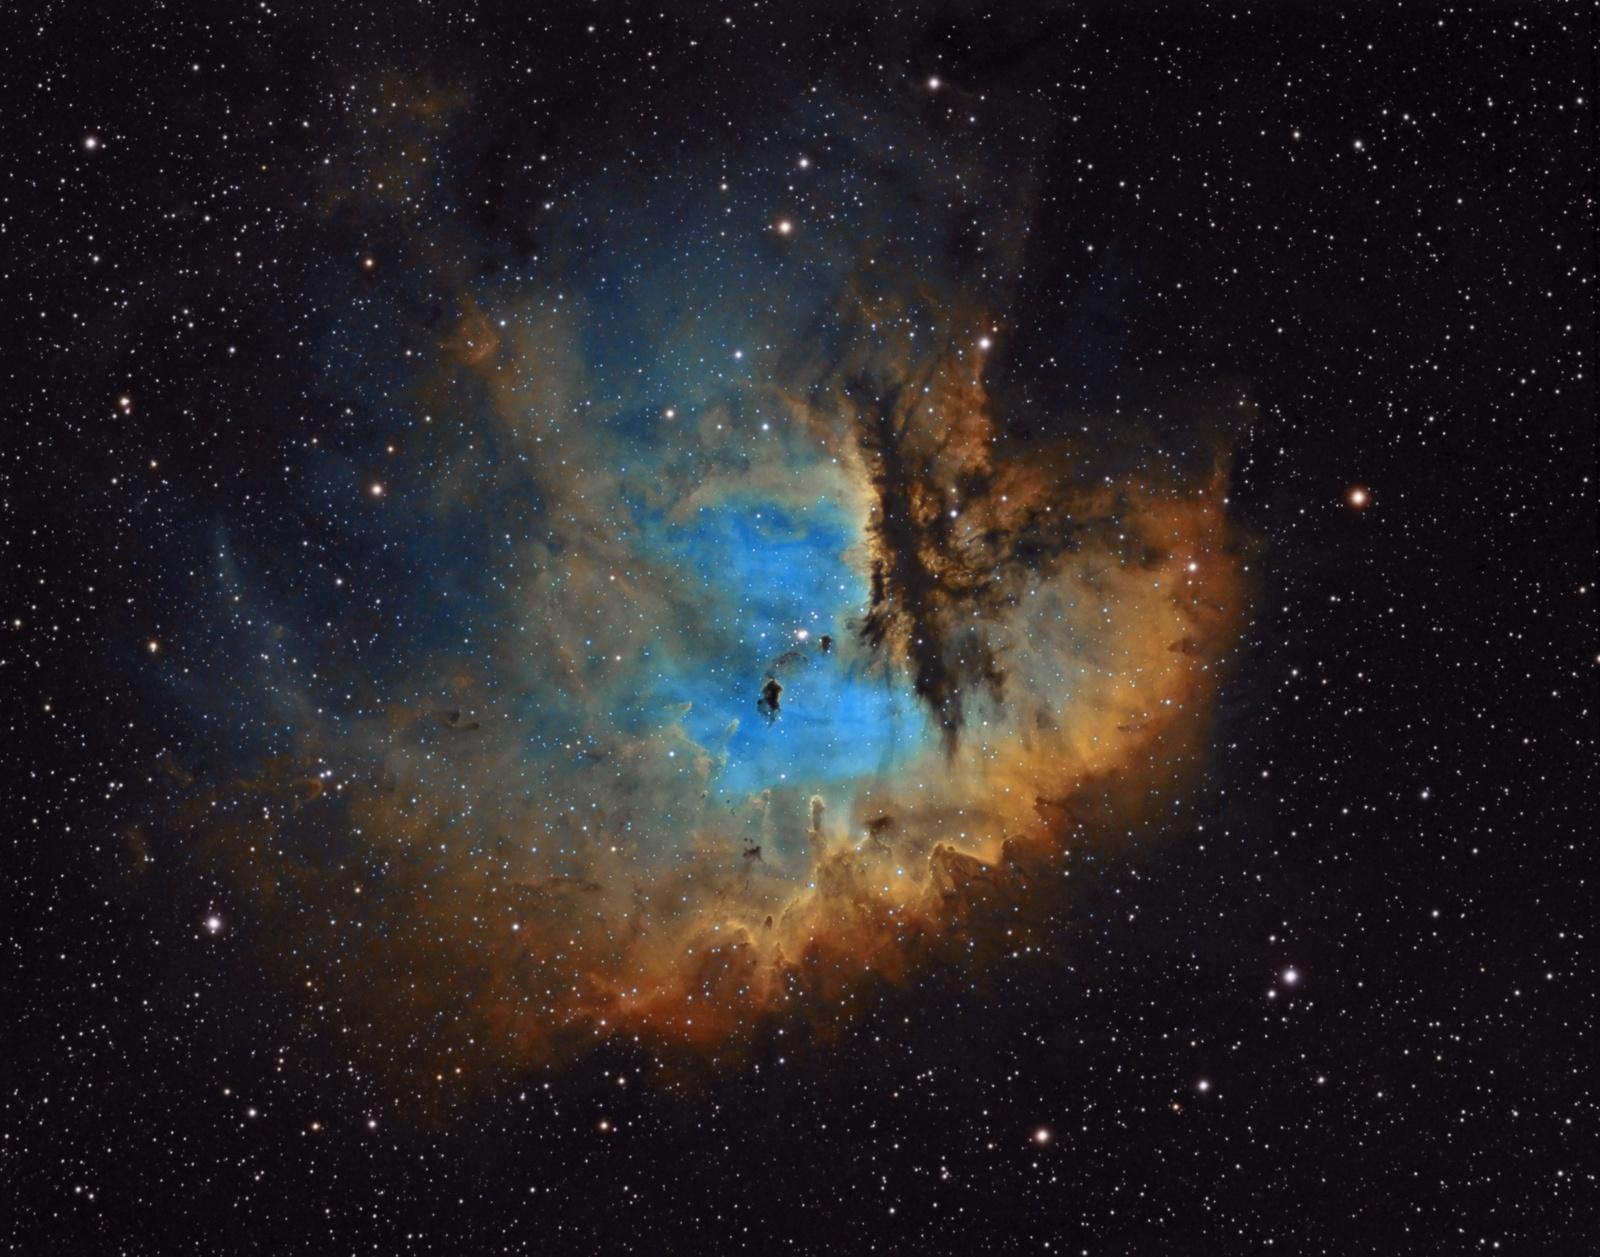 NGC281_th.thumb.jpg.b541c656e8d34604cbc6f3e7f57f0df5.jpg